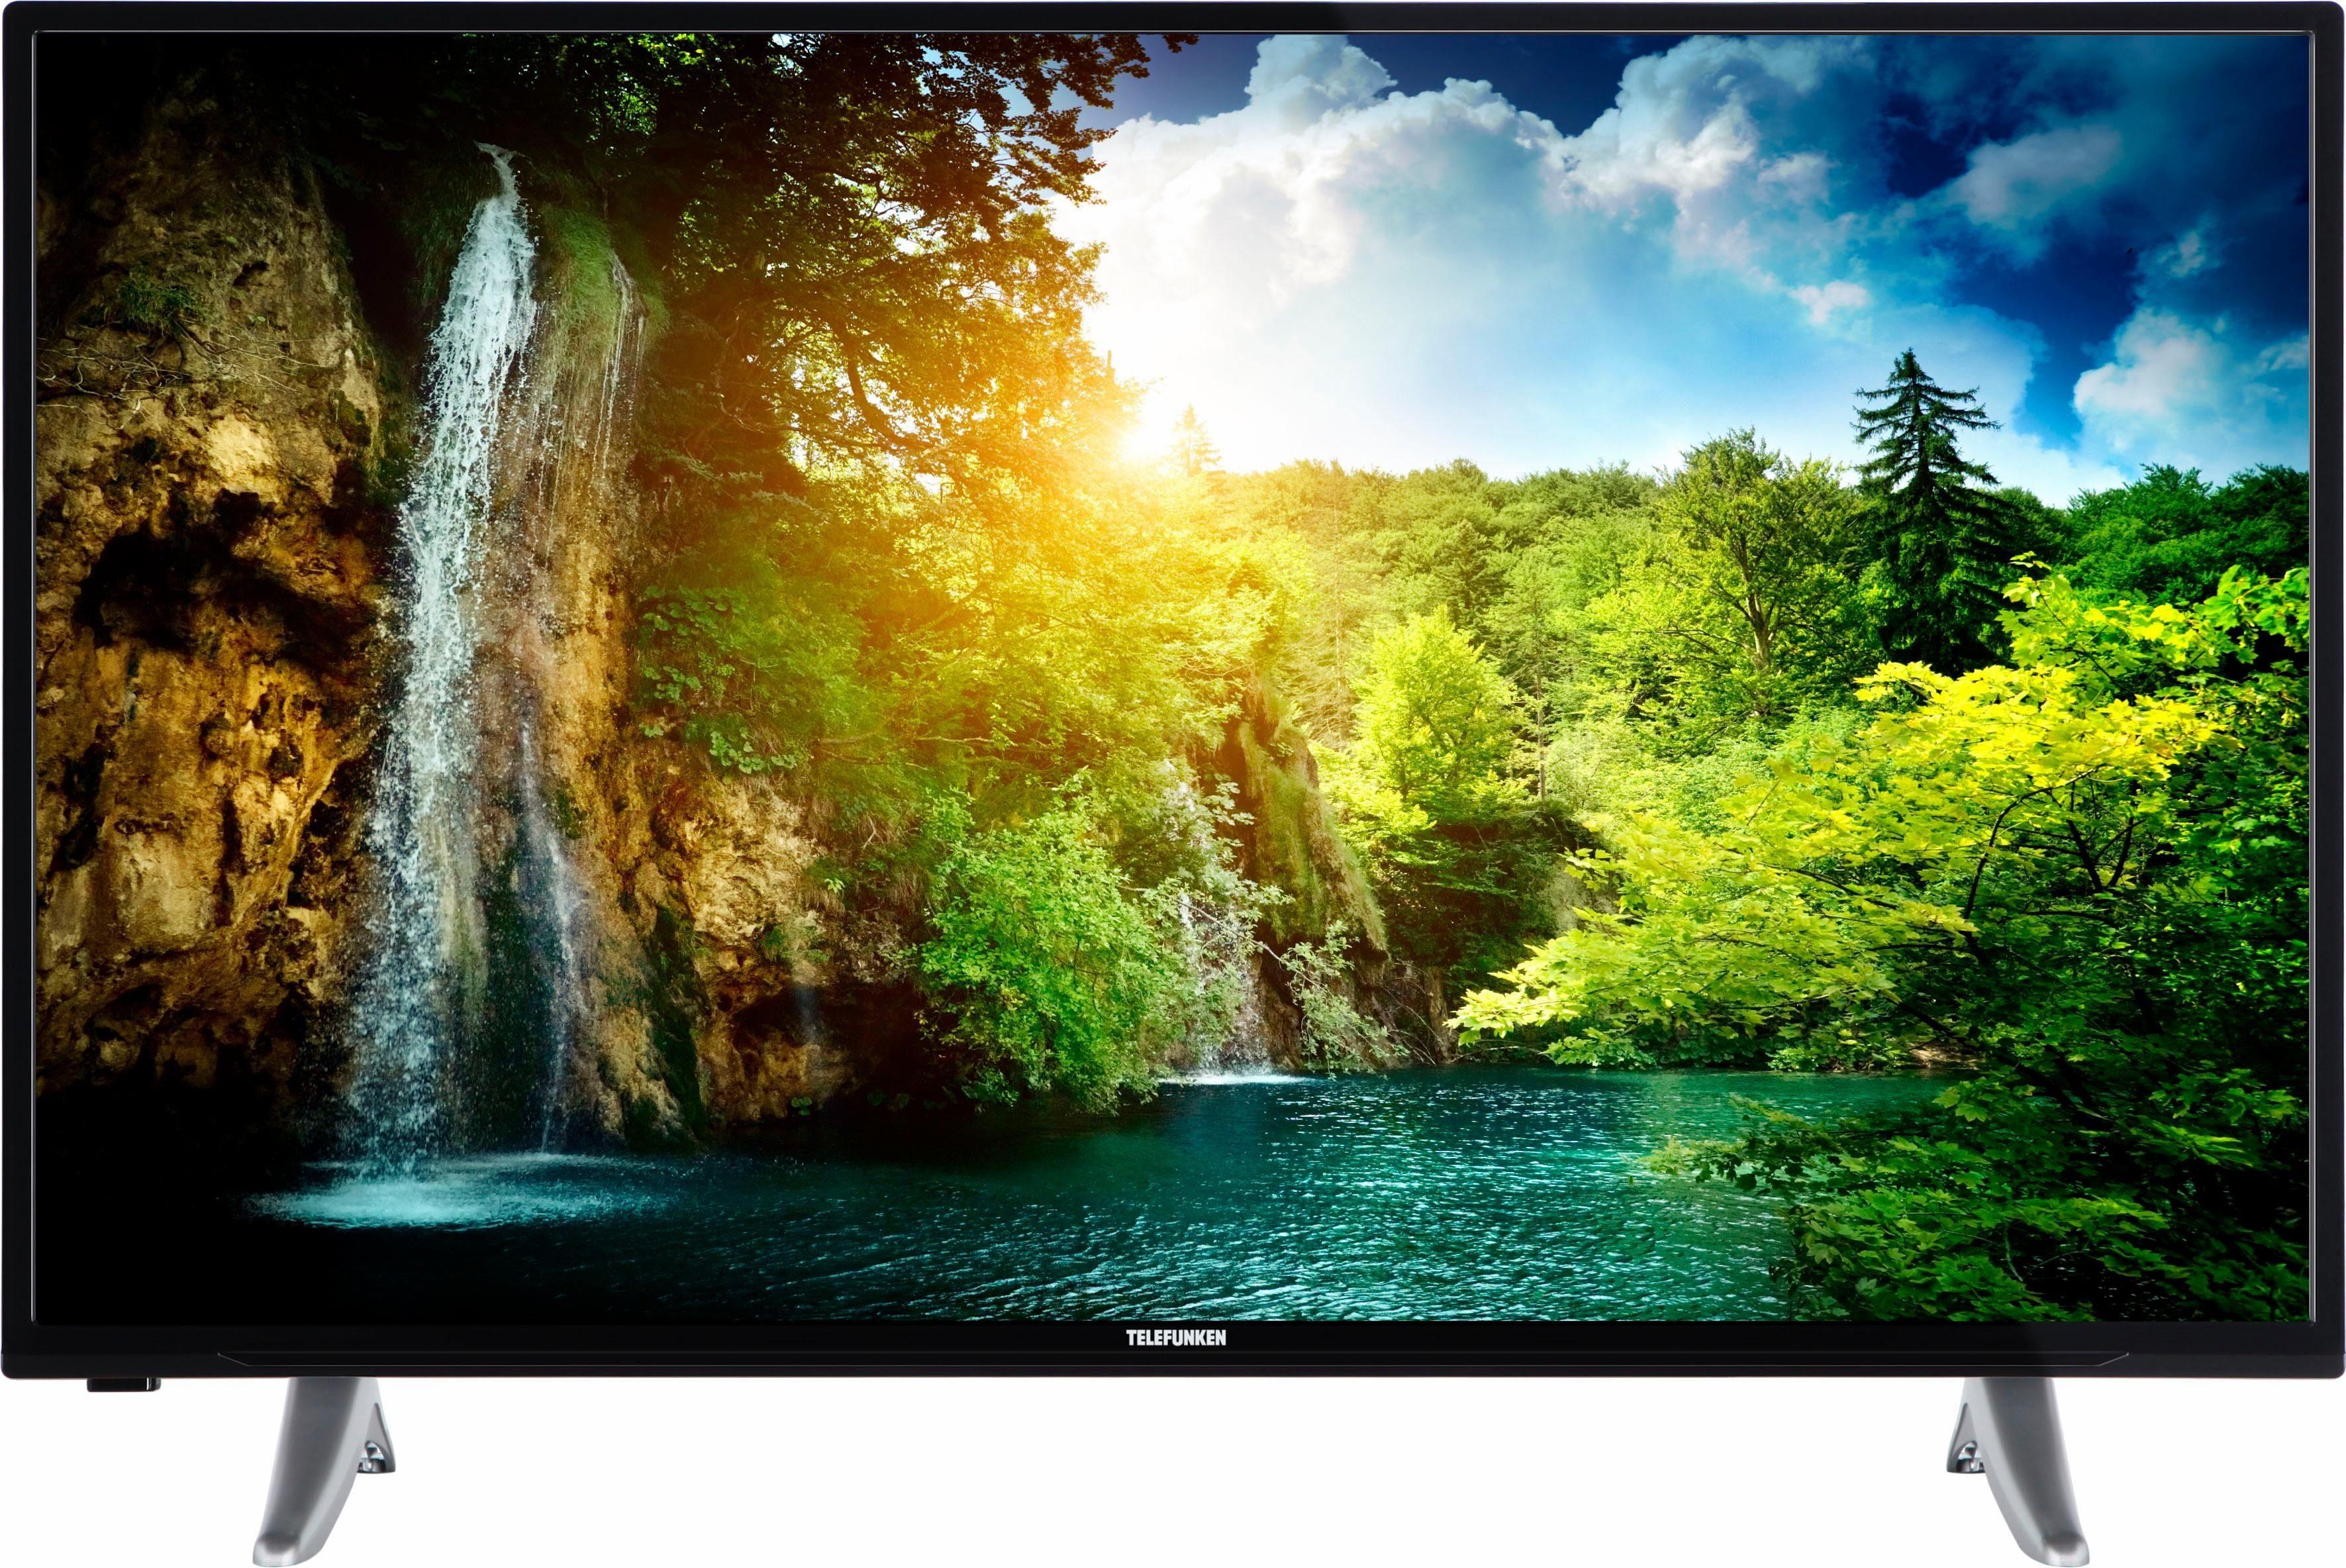 Telefunken D40F278M4CW LED-Fernseher (102 cm/40 Zoll, Full HD, Smart-TV)